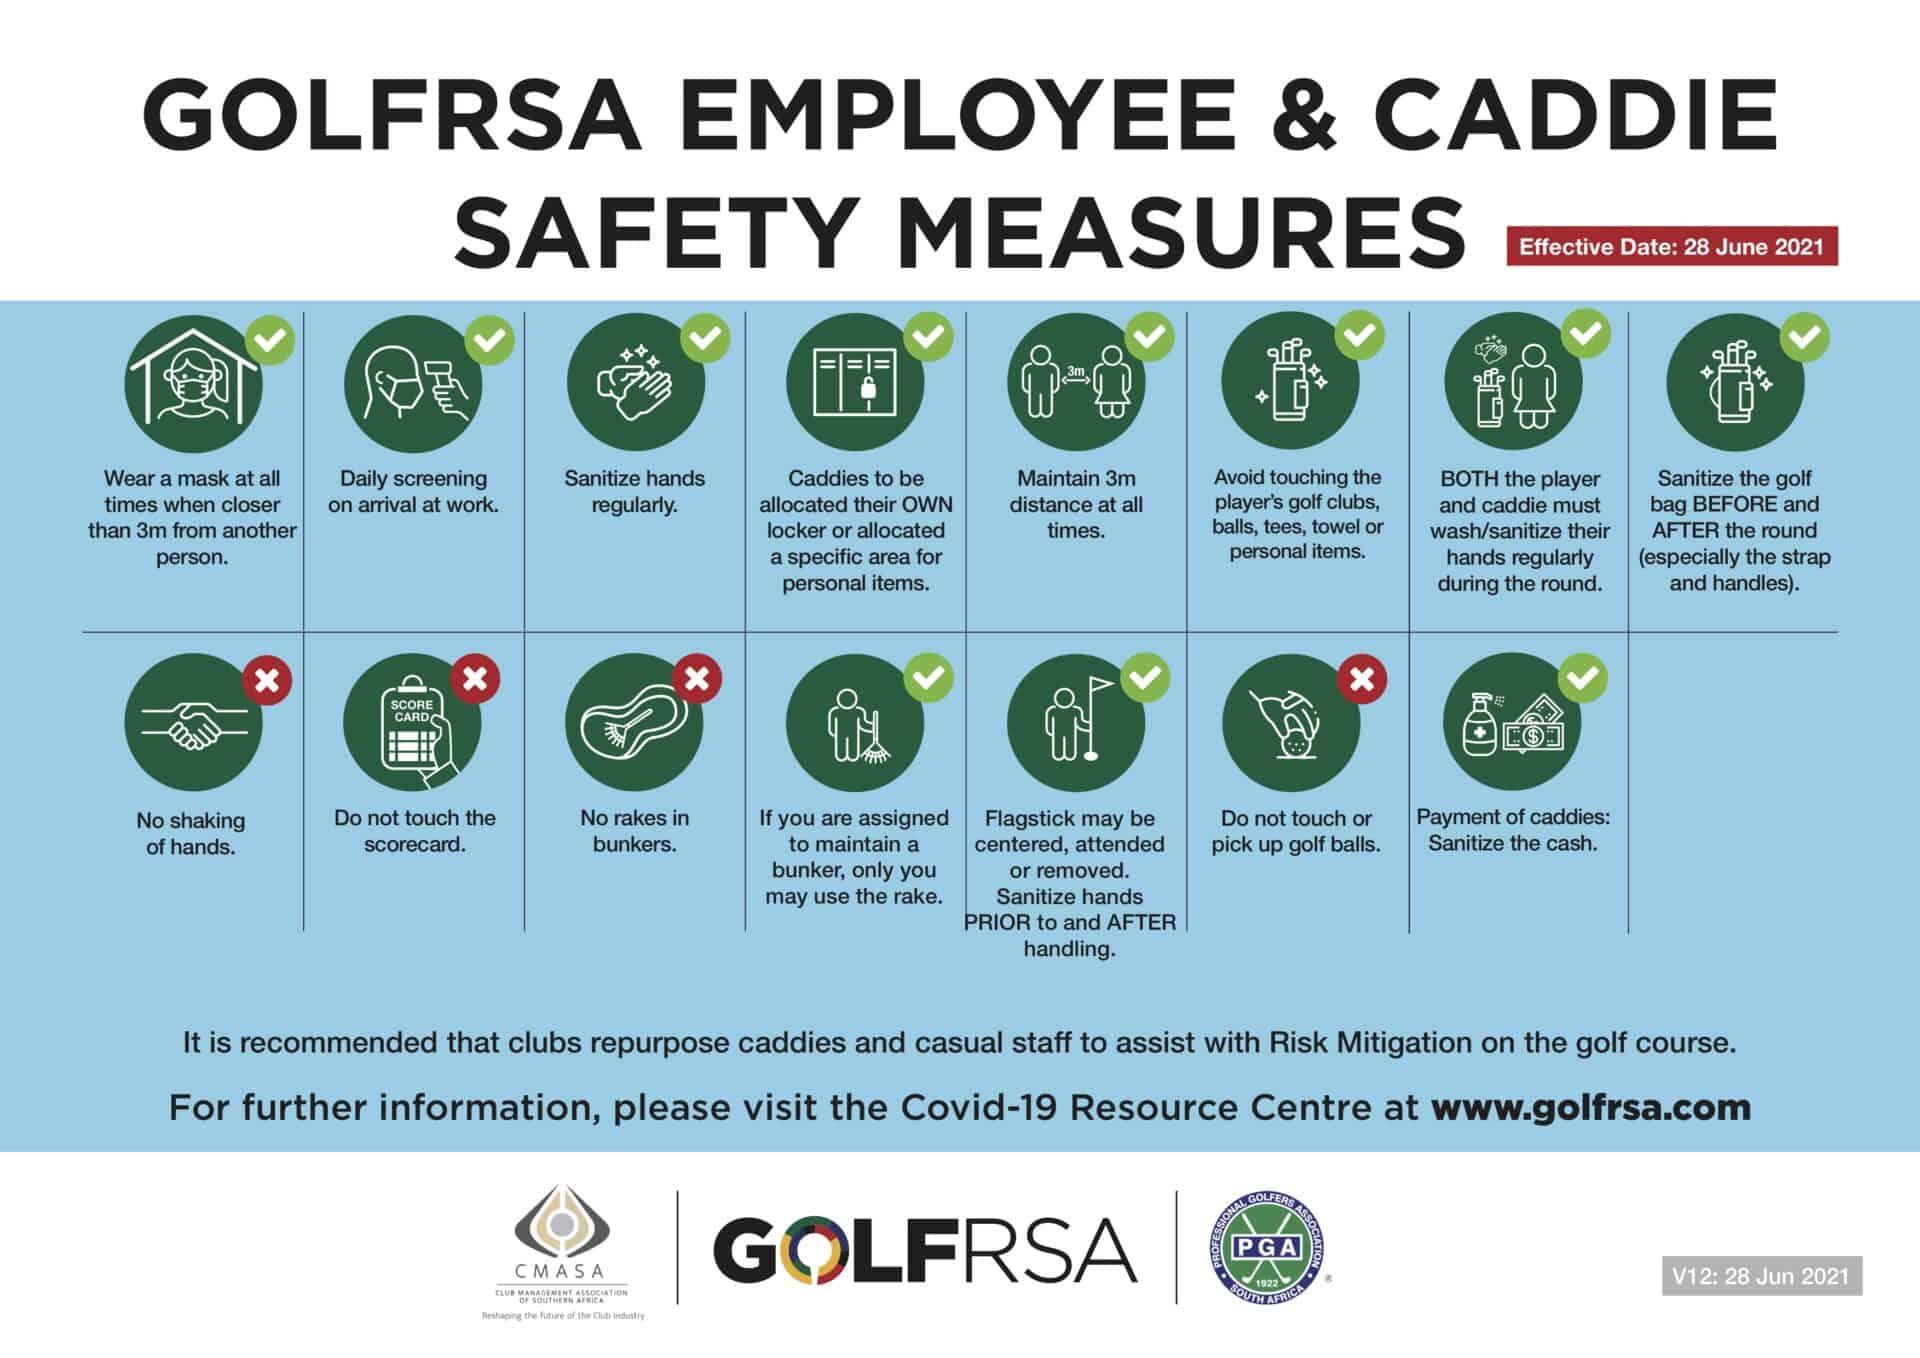 1 - ENG GolfRSA caddie and employee safety measures V12 - Jun 2021